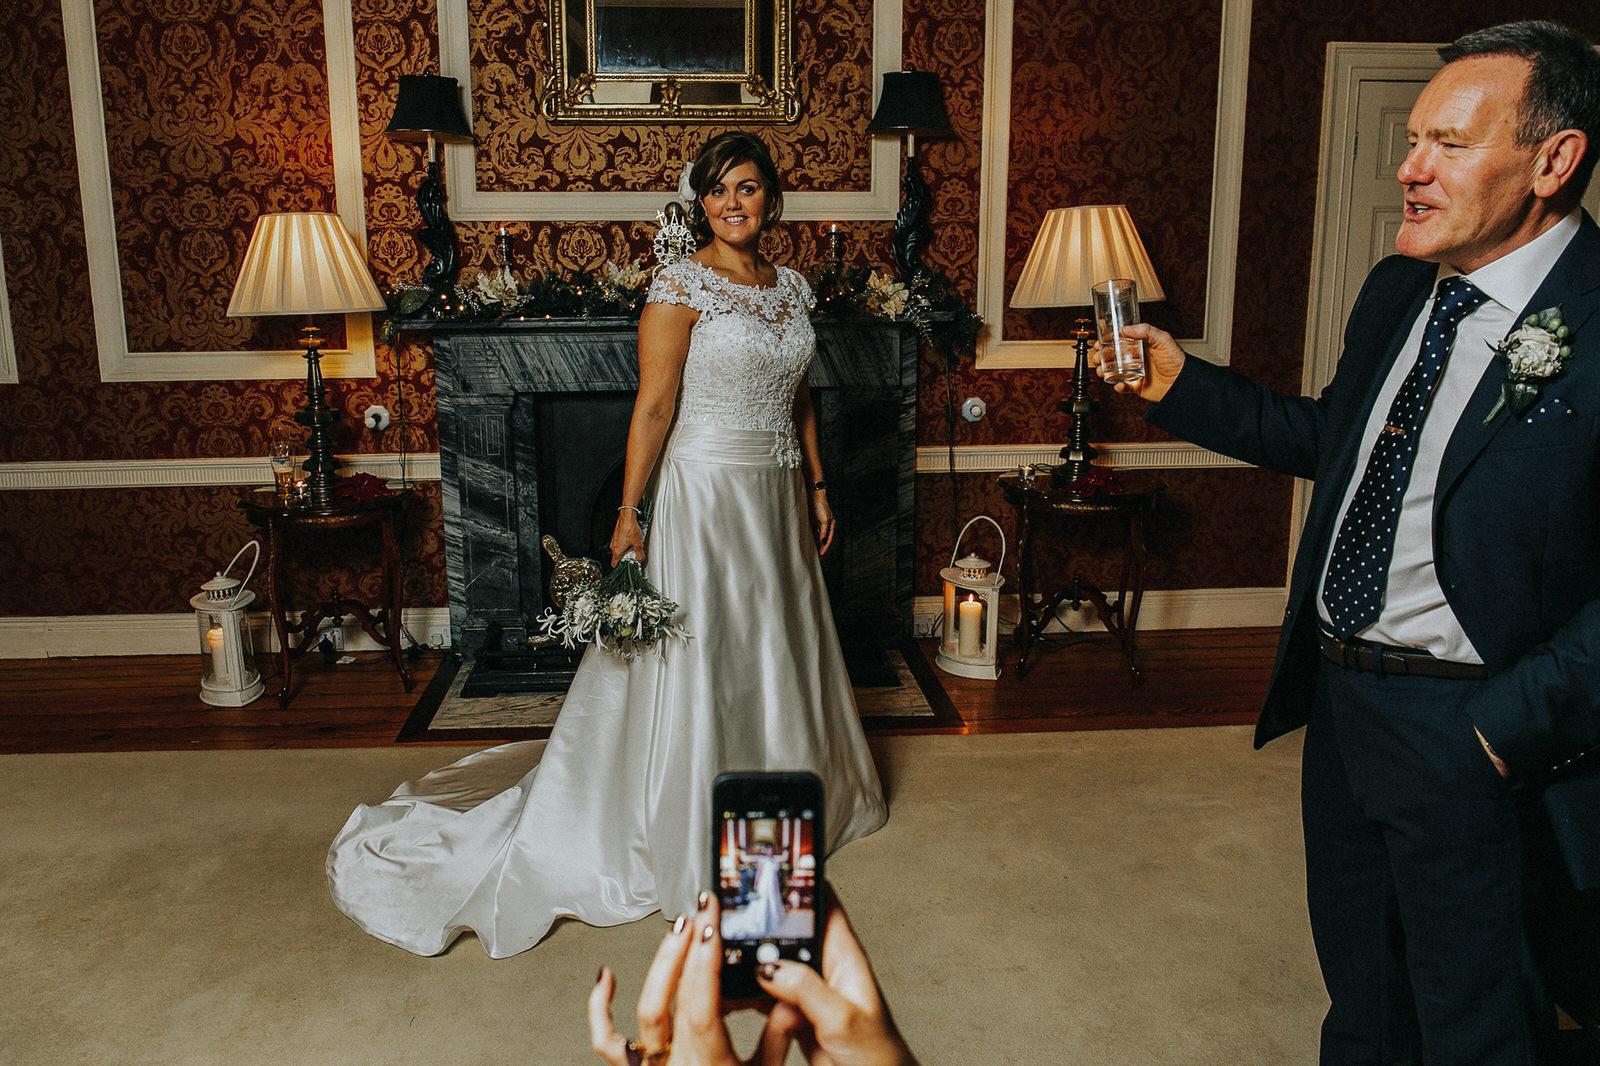 Roger_Kenny_wedding_photographer_Tankardstown_631.jpg